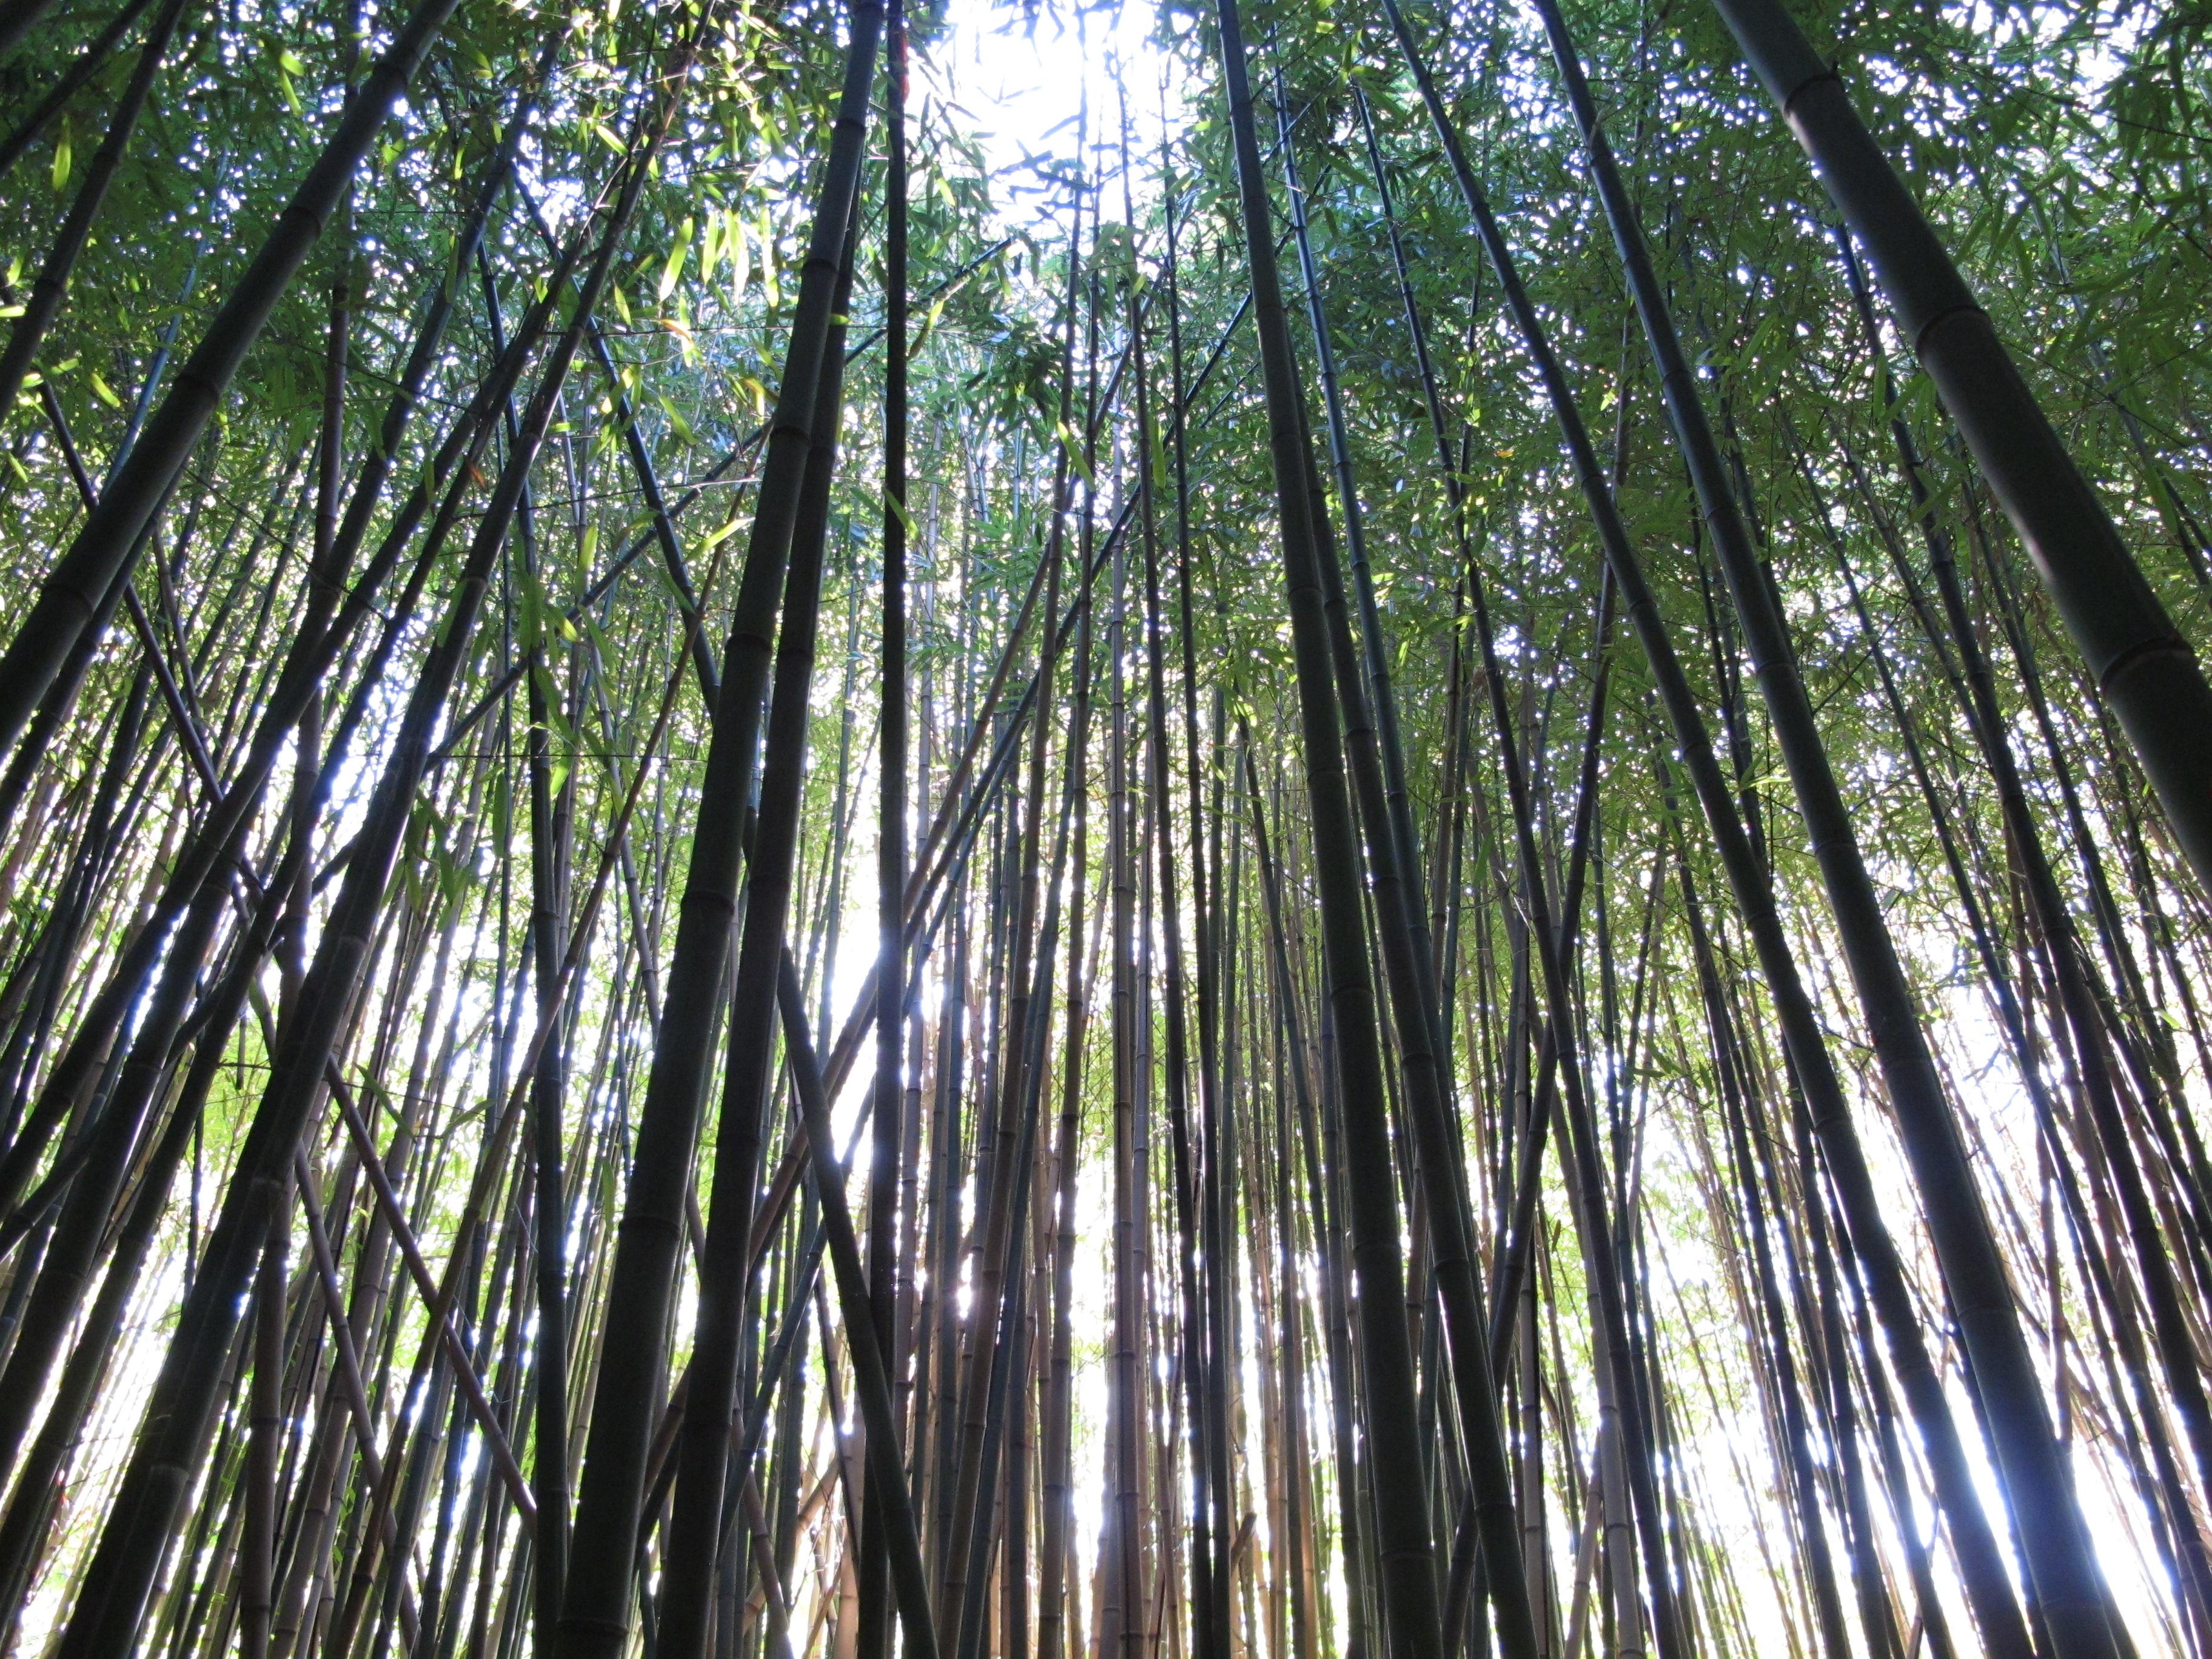 Bosco Di Bamb.File Bosco Di Bambu Jpg Wikimedia Commons